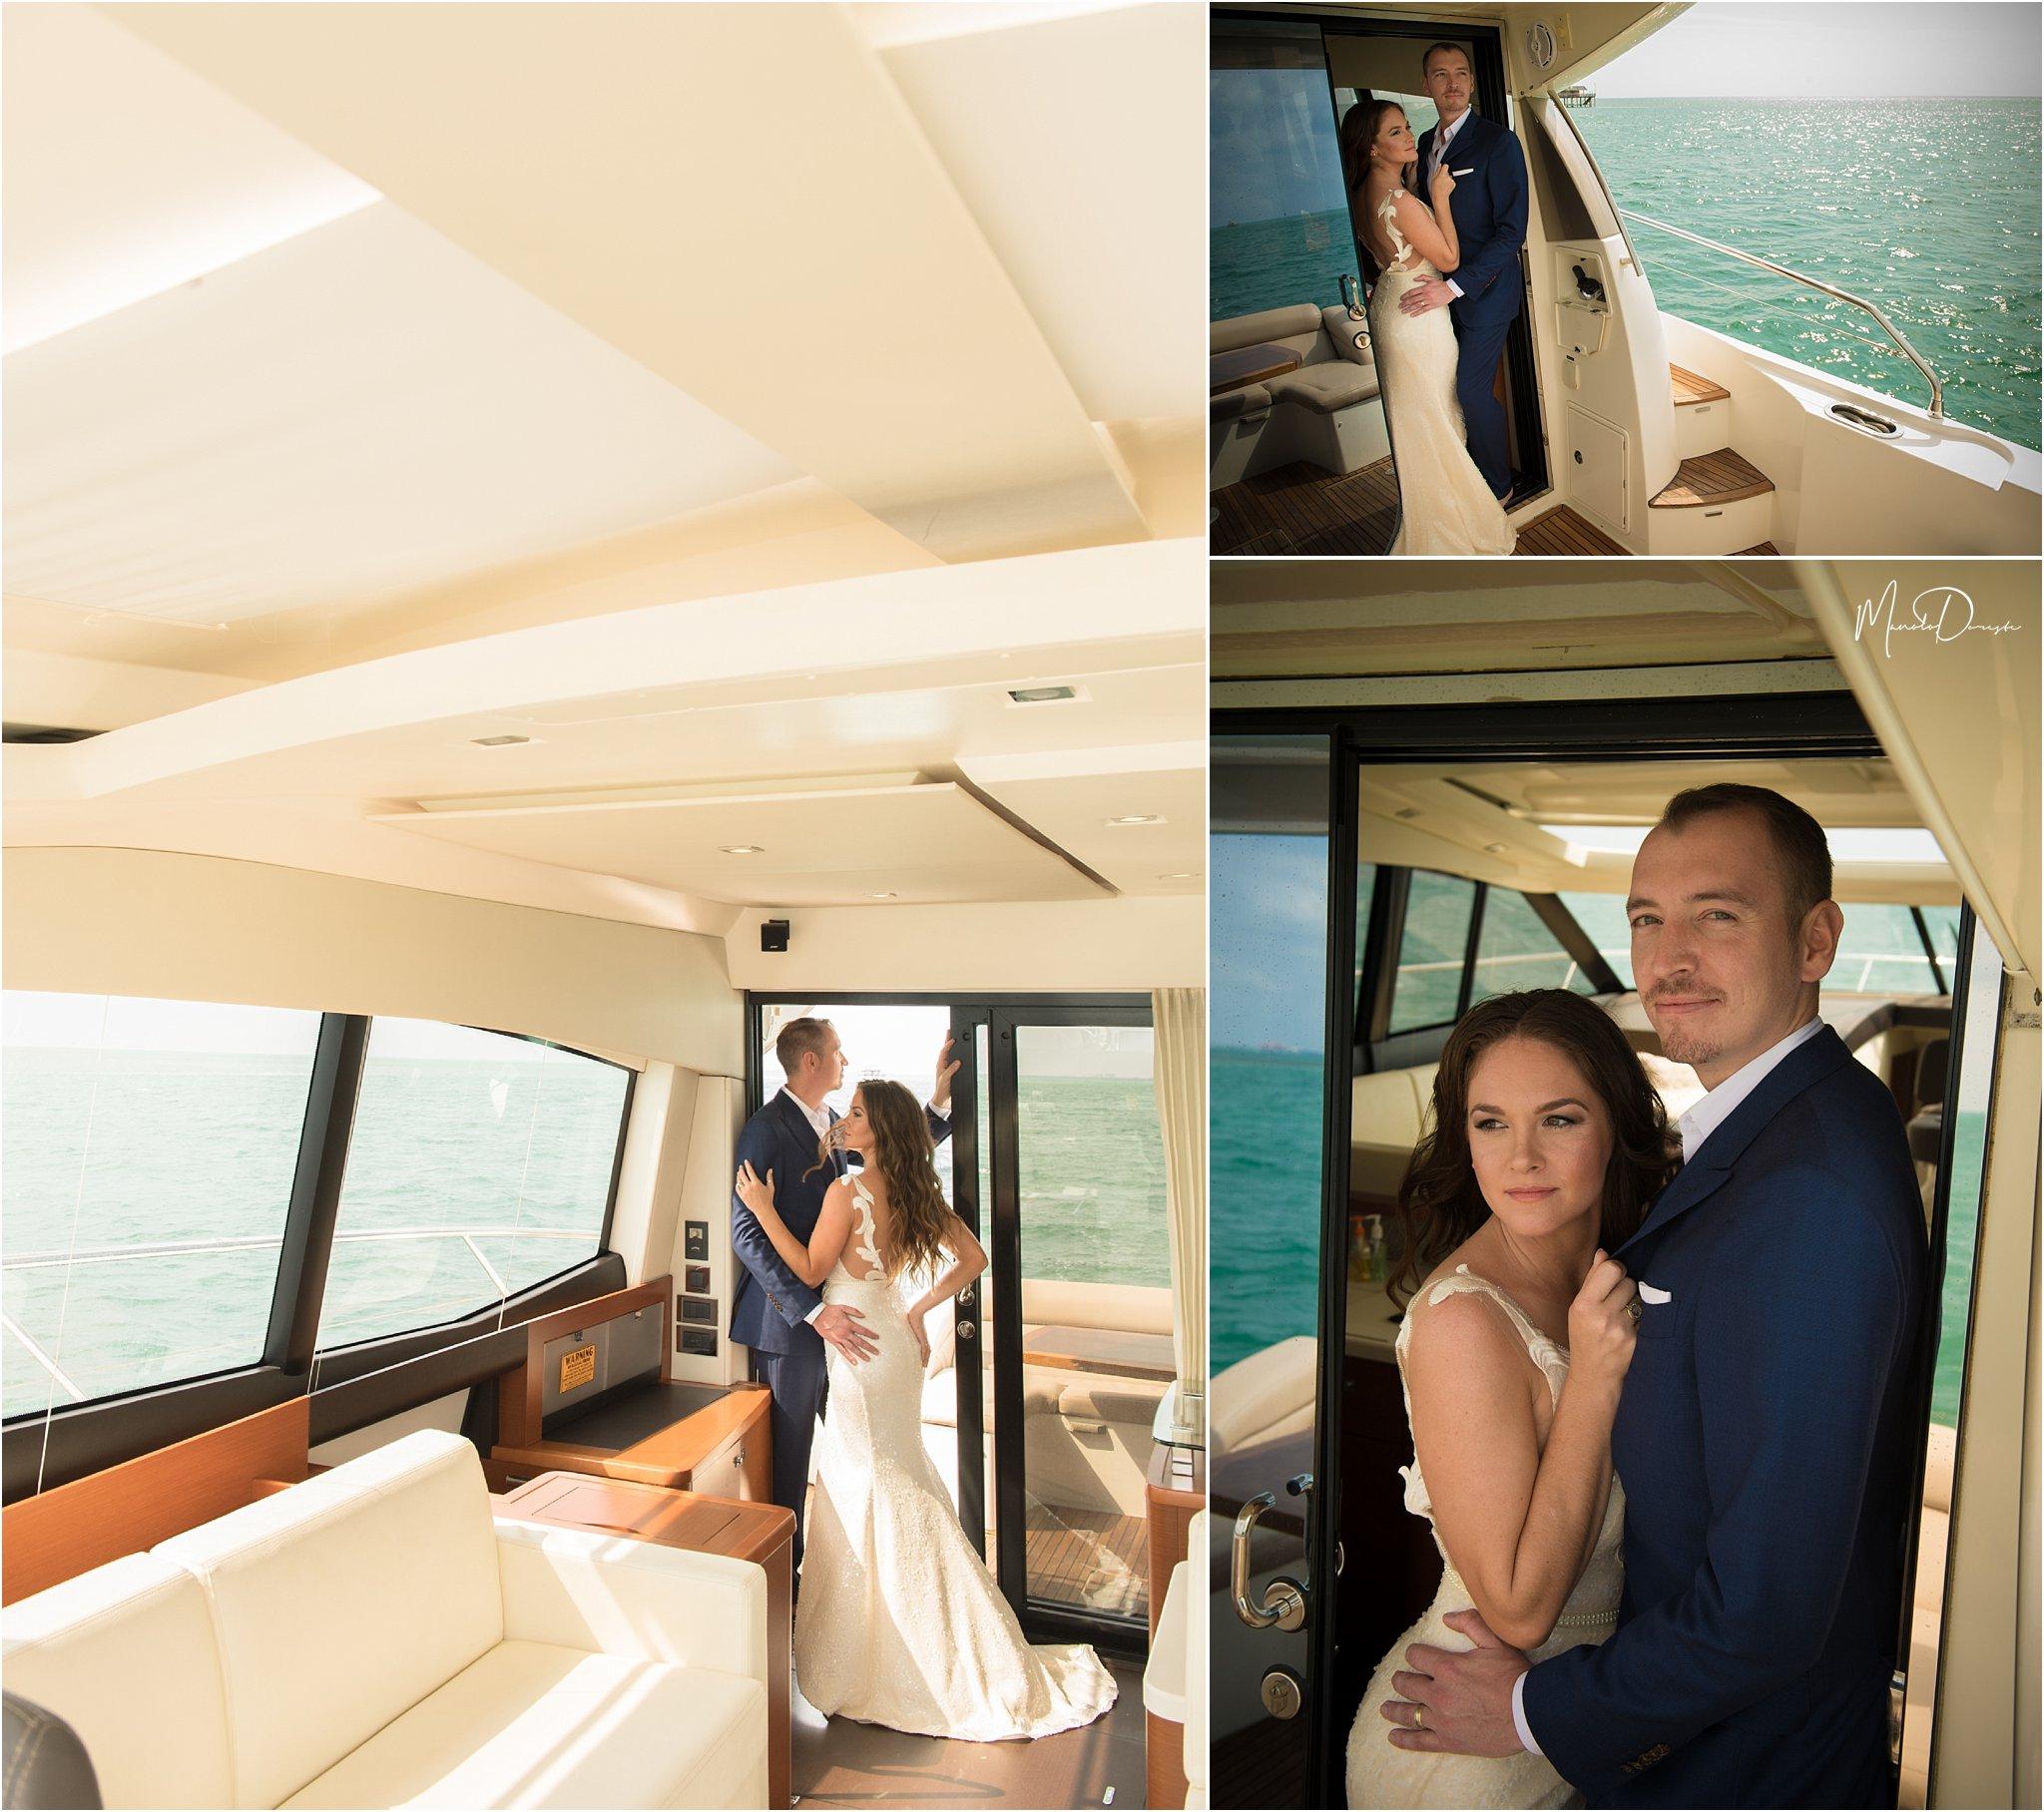 00891_ManoloDoreste_InFocusStudios_Wedding_Family_Photography_Miami_MiamiPhotographer.jpg